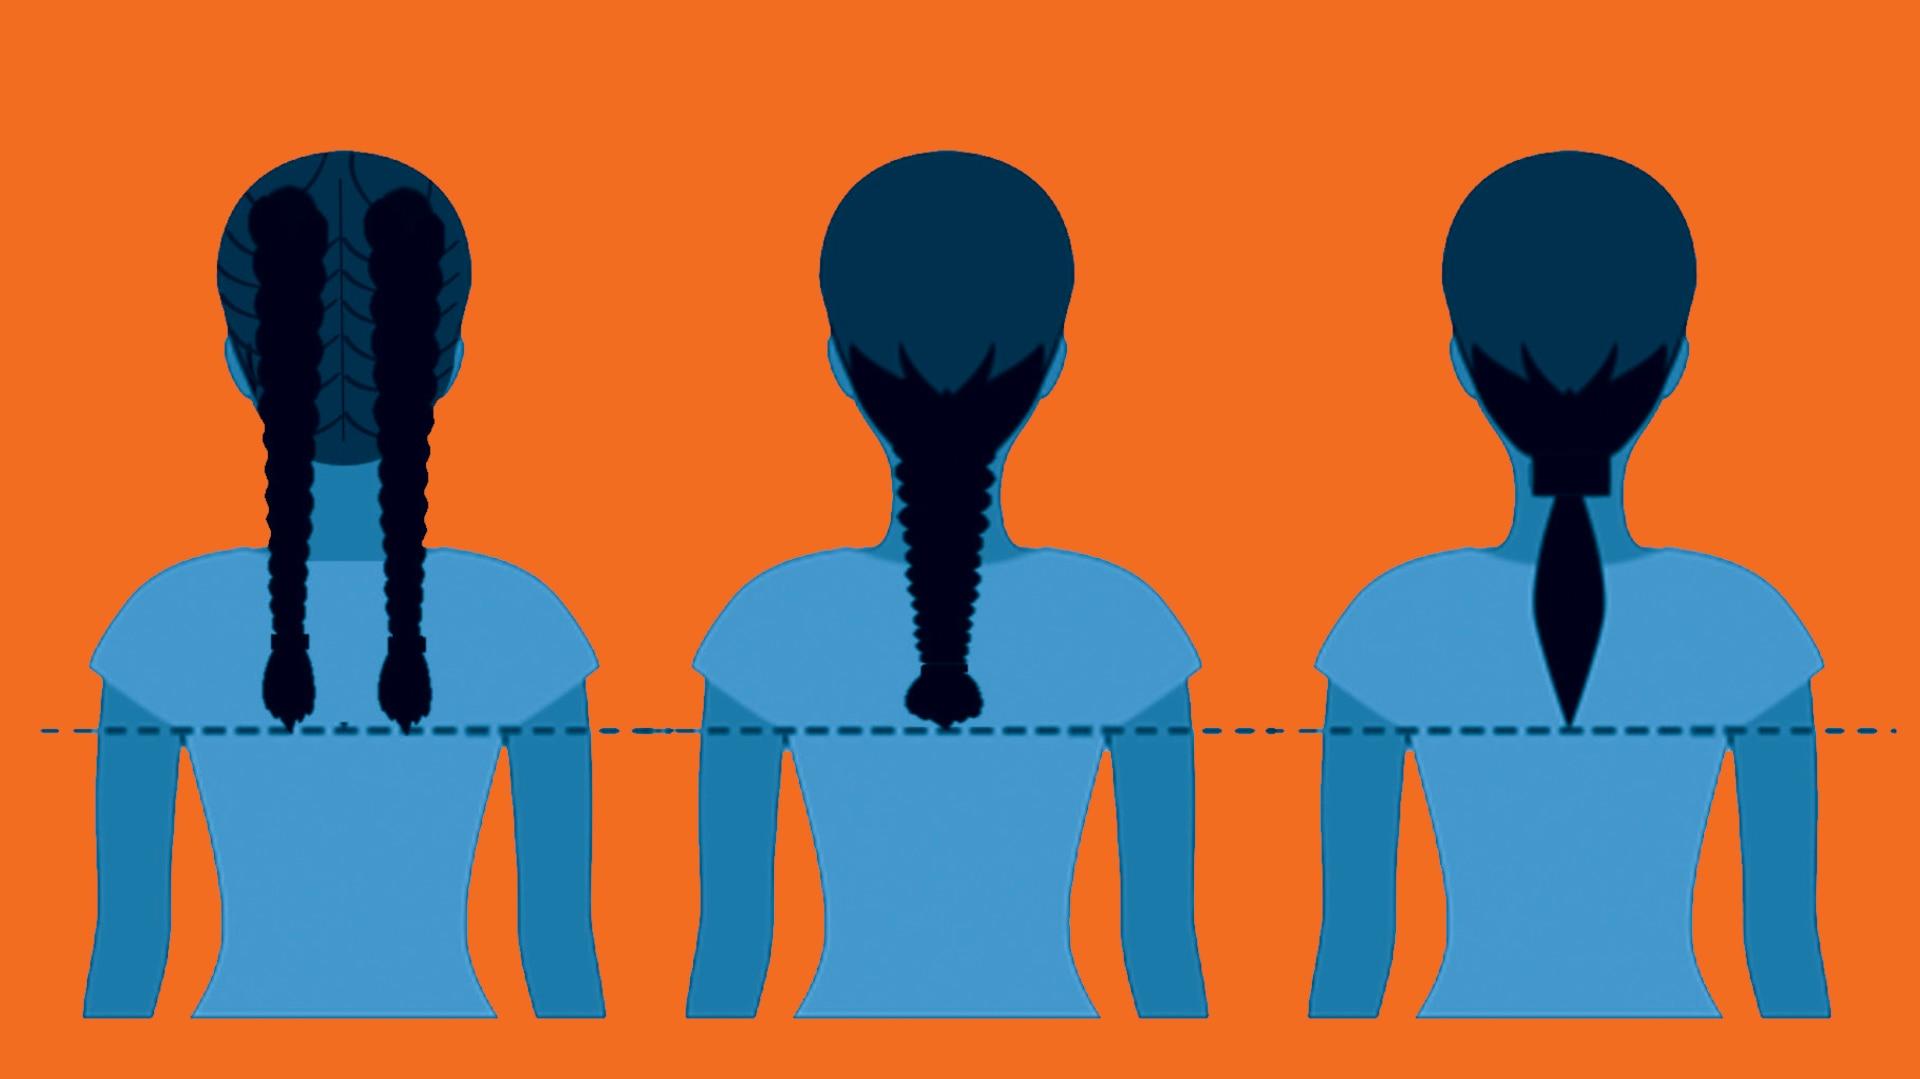 USCG now allows braids, ponytails.